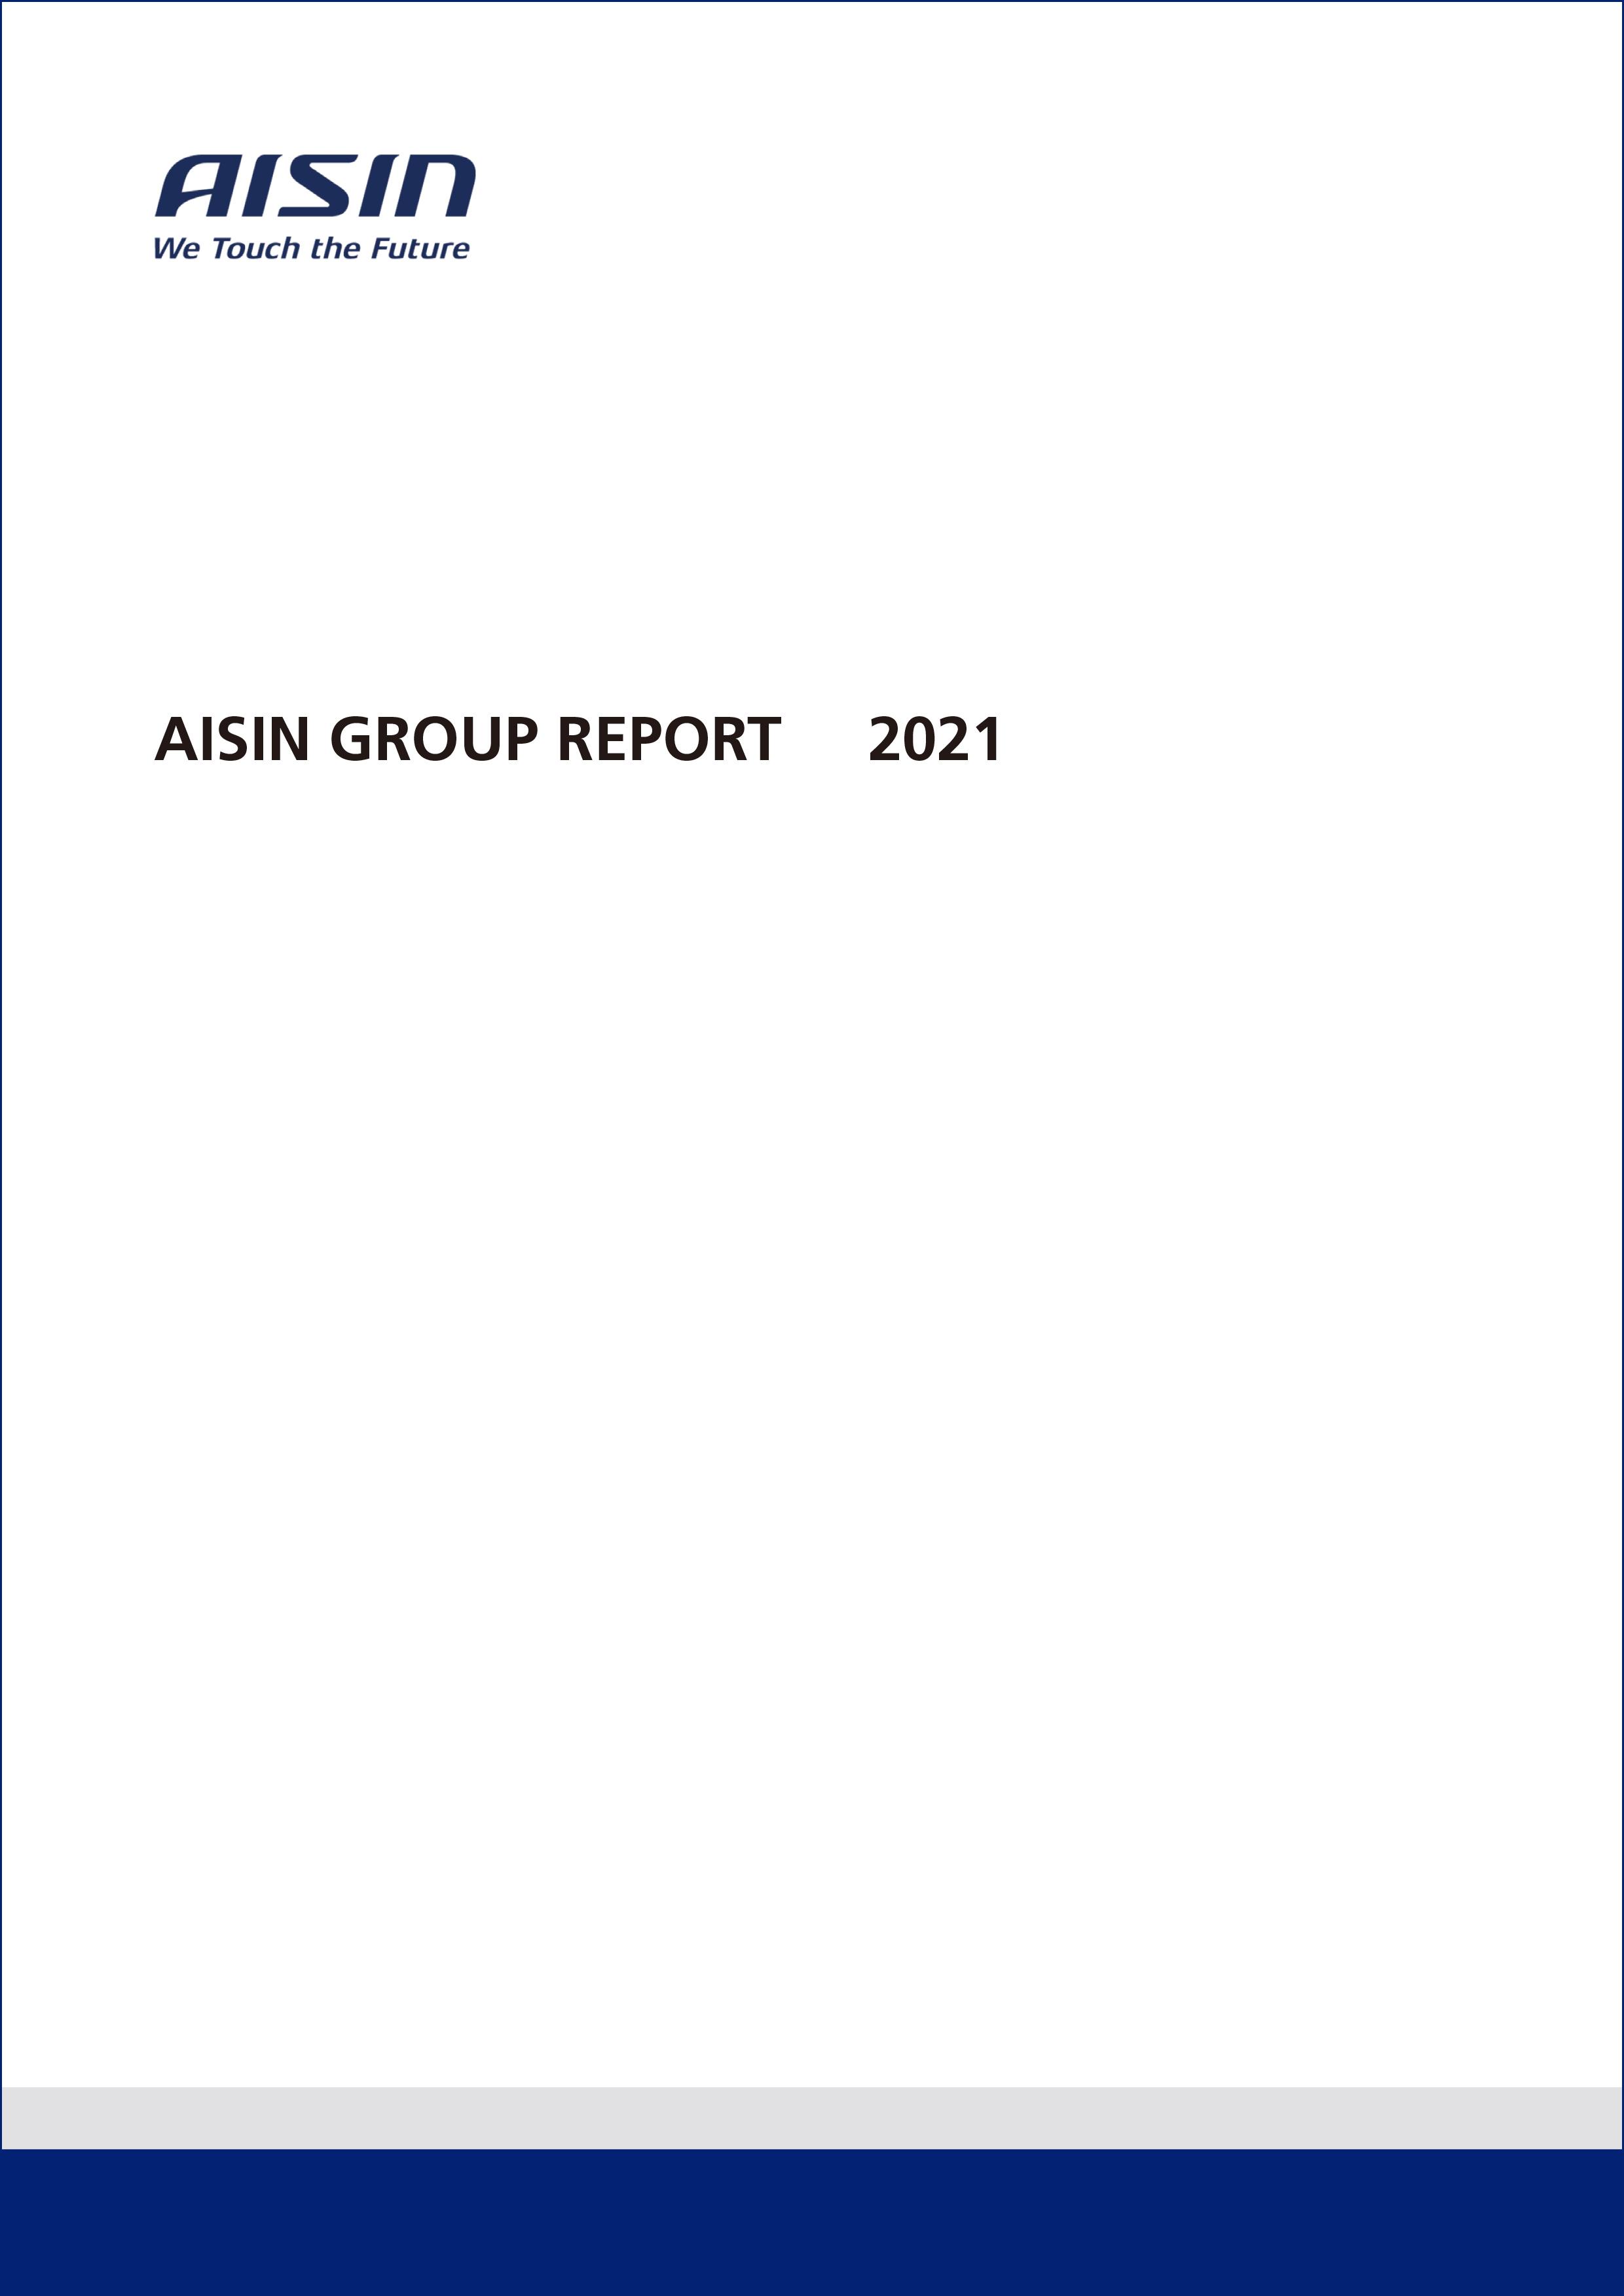 AISIN GROUP REPORT 2021(アイシングループレポート 2021)